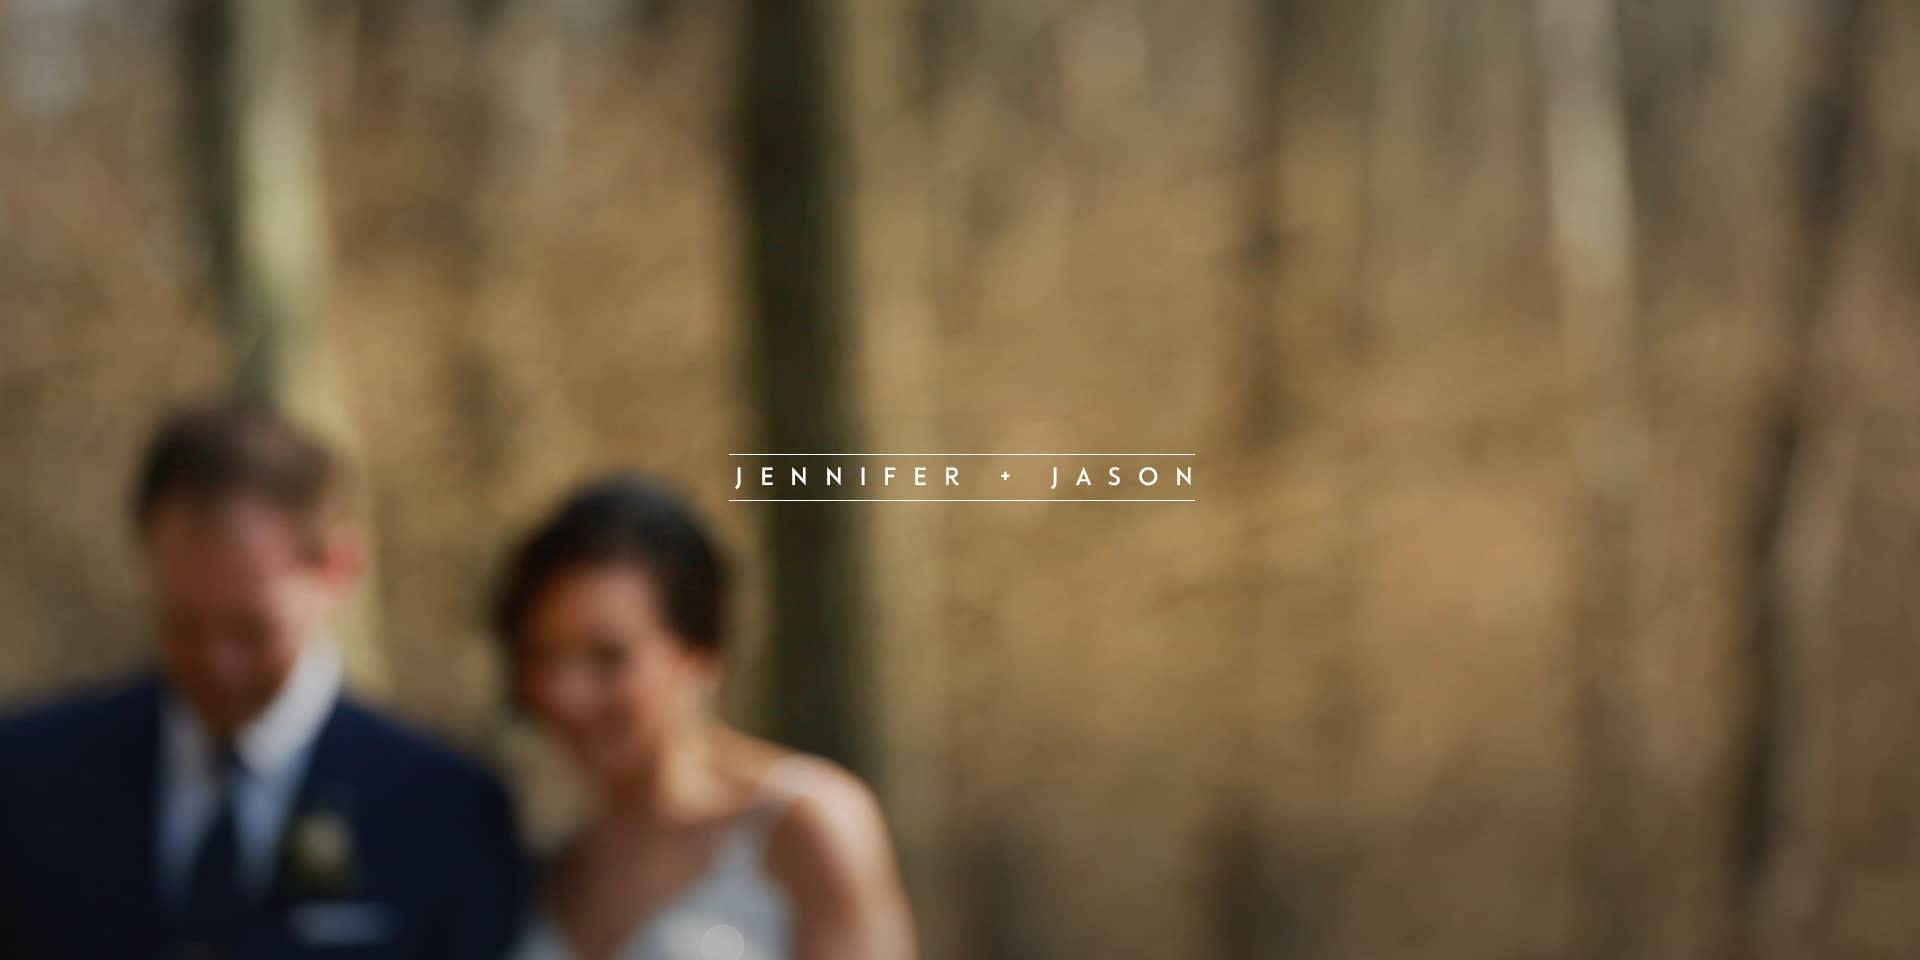 Jennifer + Jason | Thompson, Connecticut